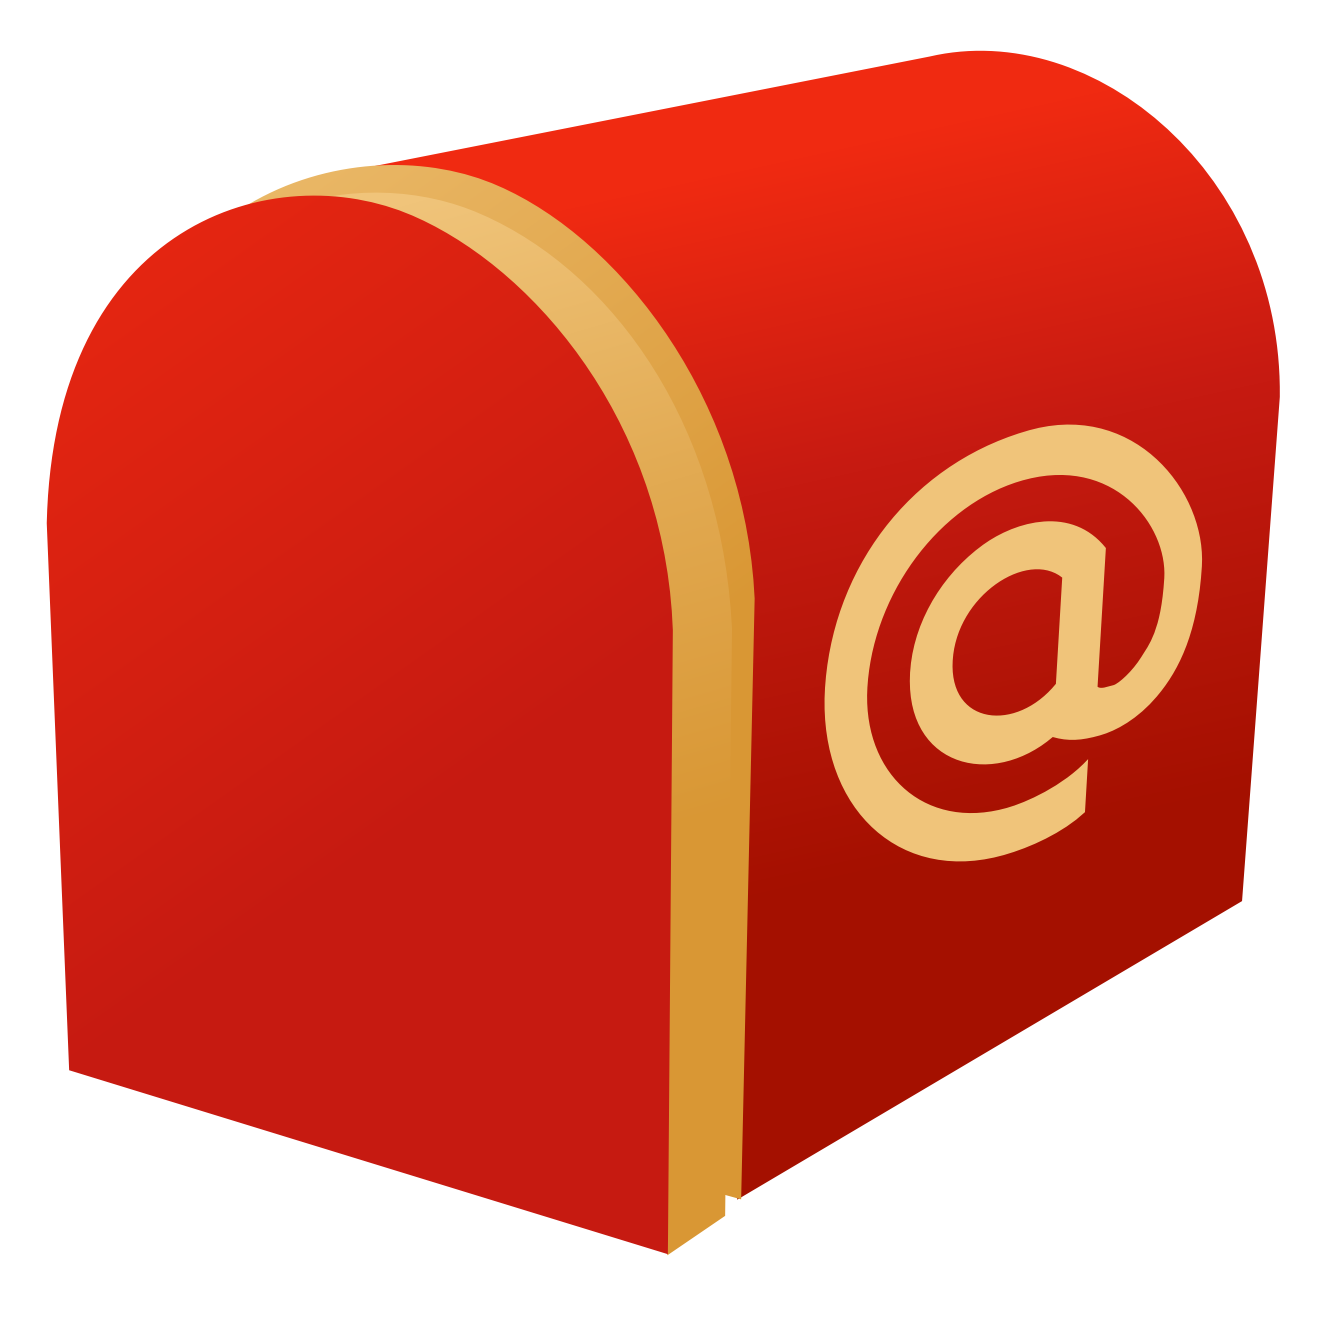 Mailbox clipart svg. Big image png